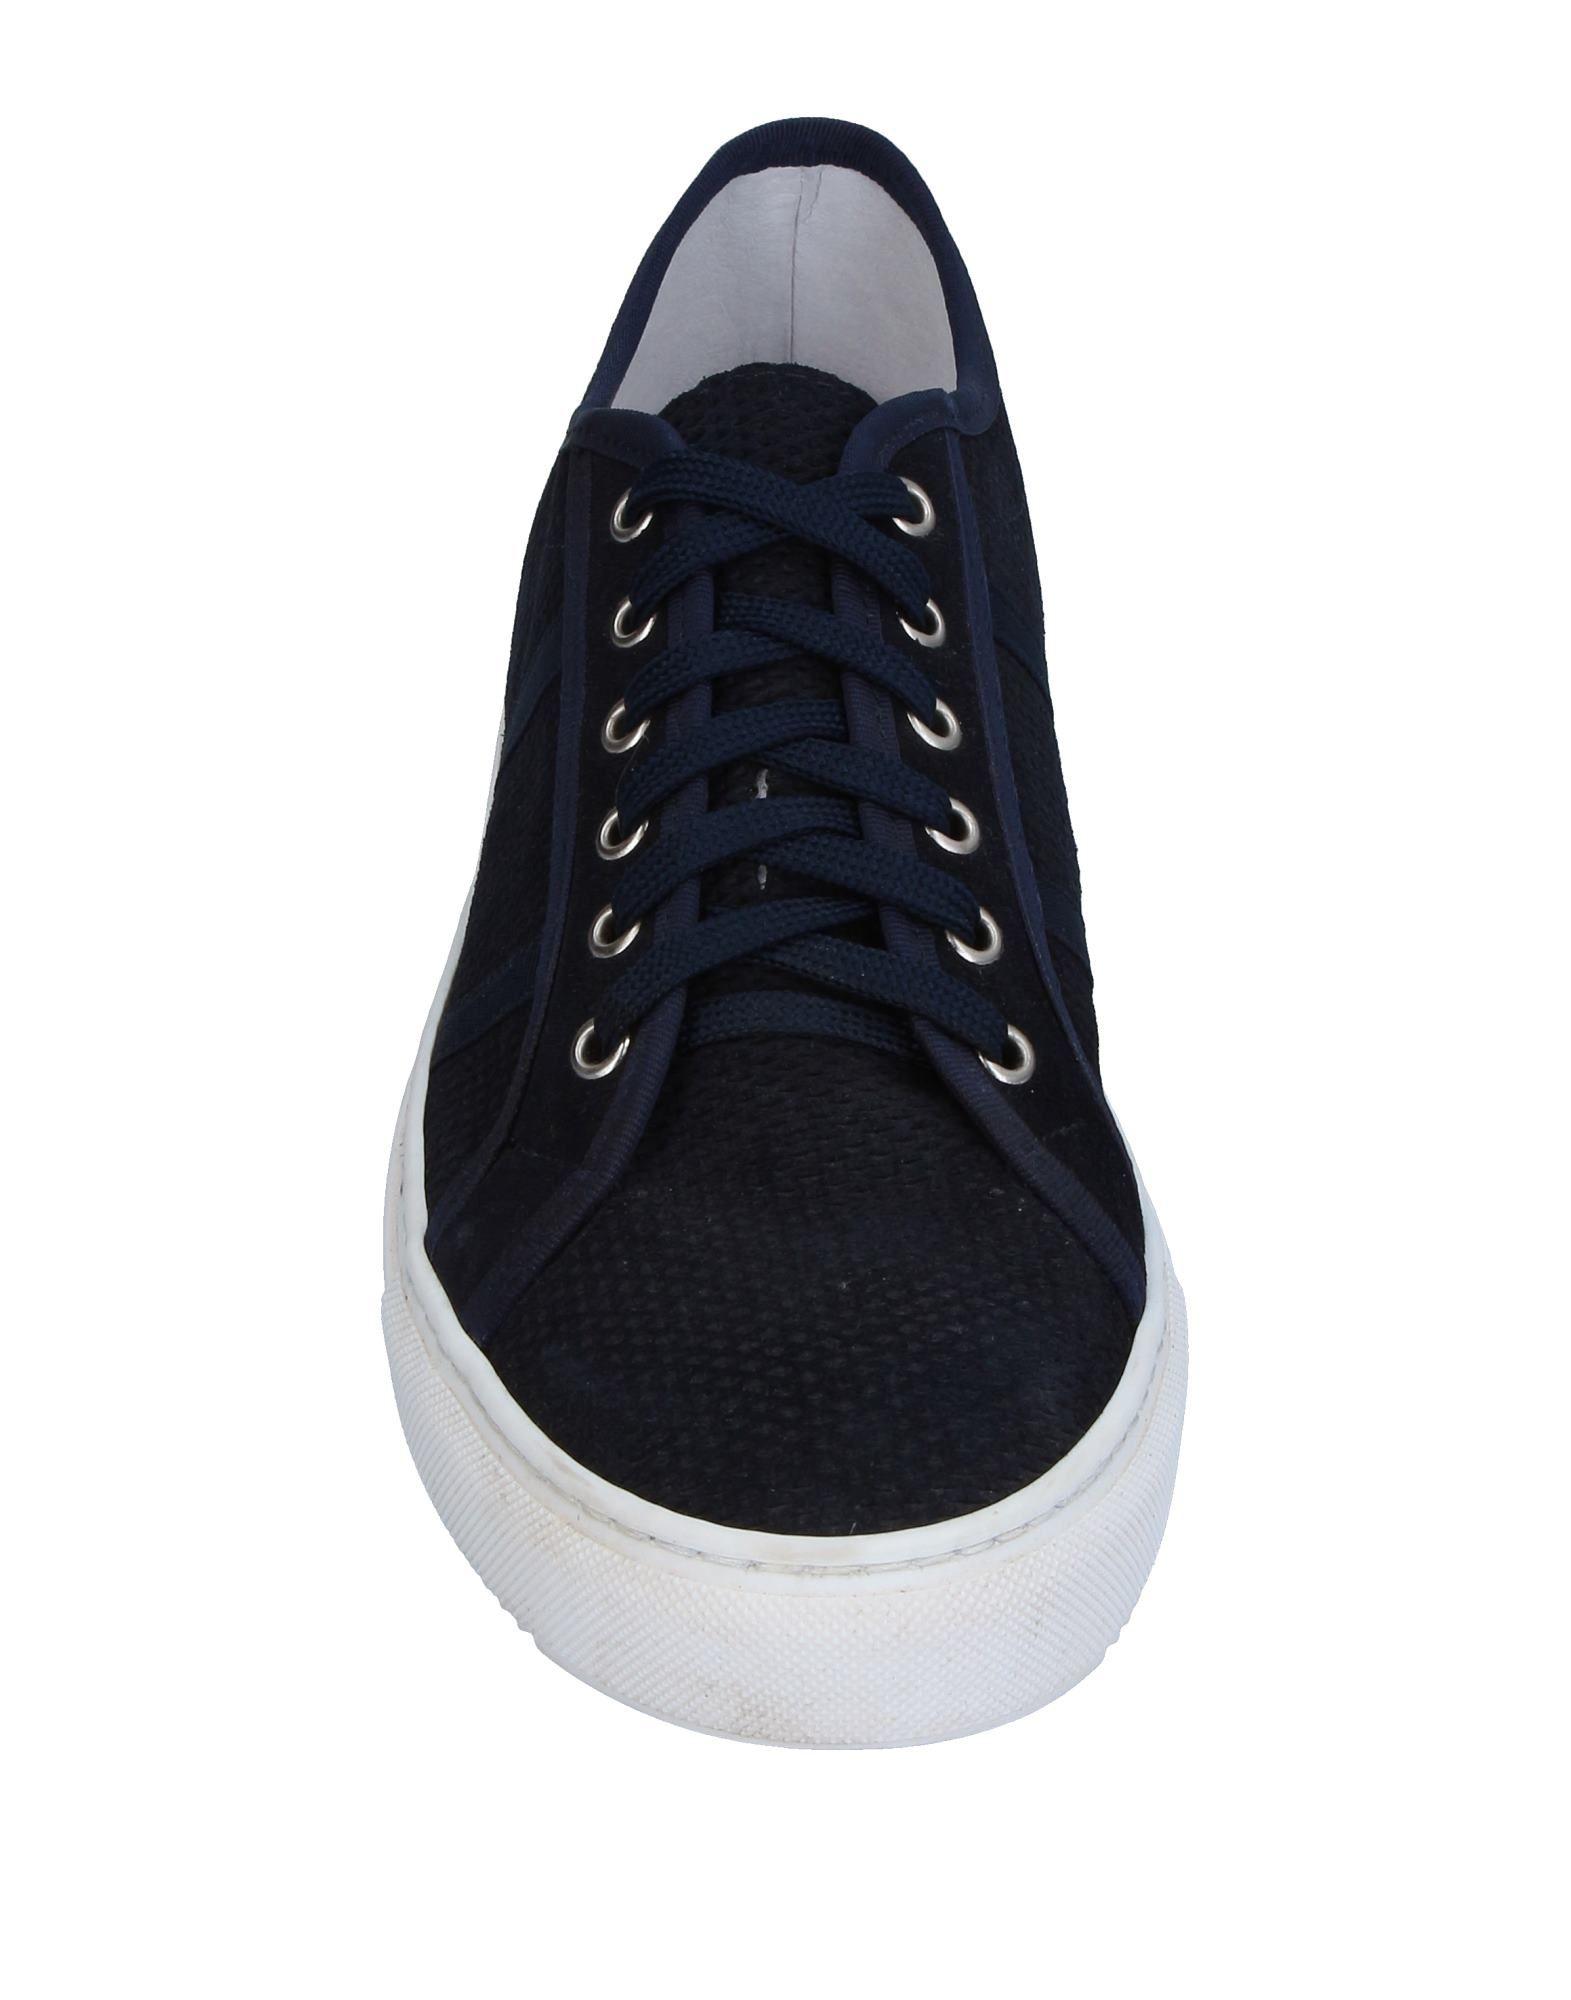 Sneakers Daniele Alessandrini Homme Homme - Sneakers Daniele Alessandrini  Homme sur ...